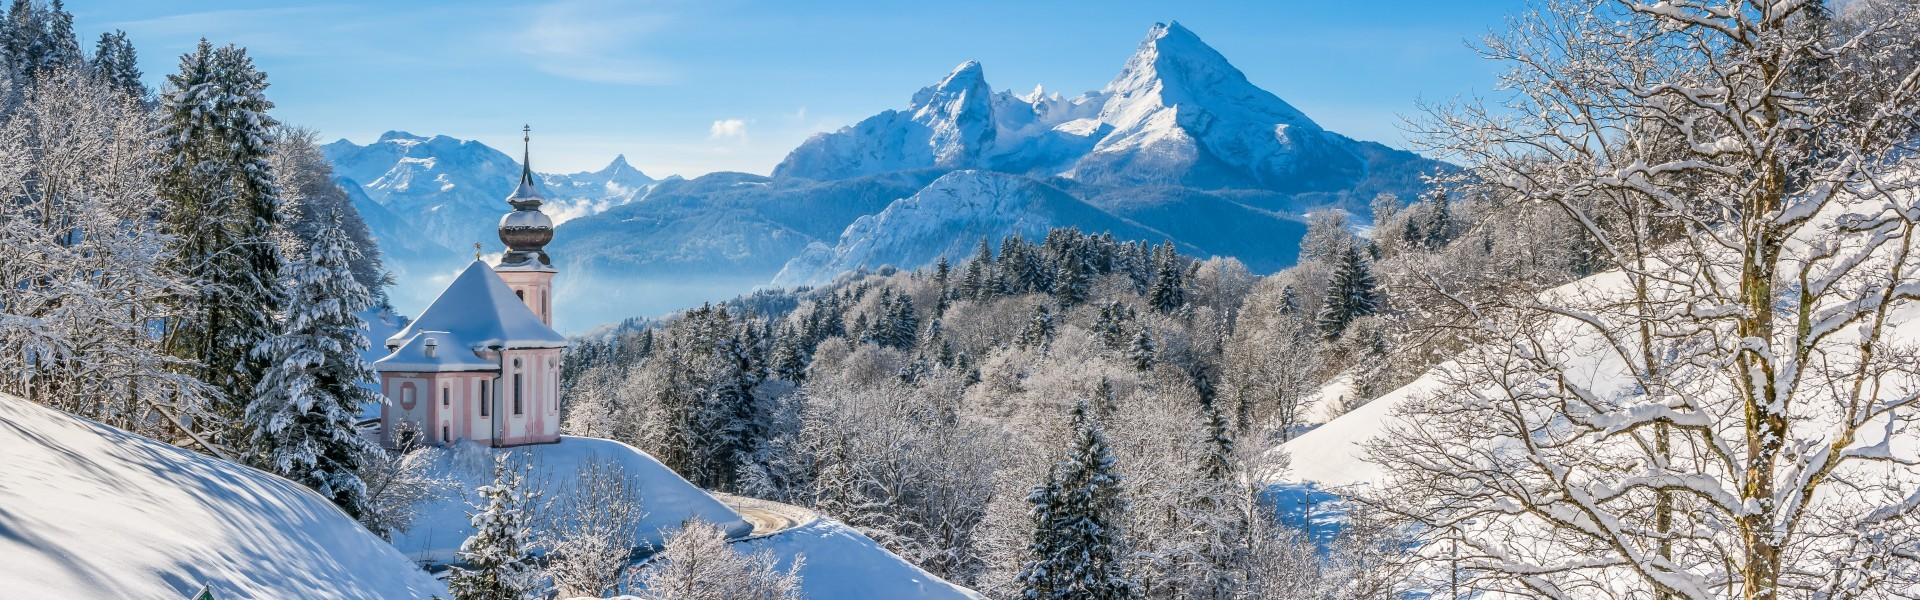 Maria Gern - Berchtesgaden